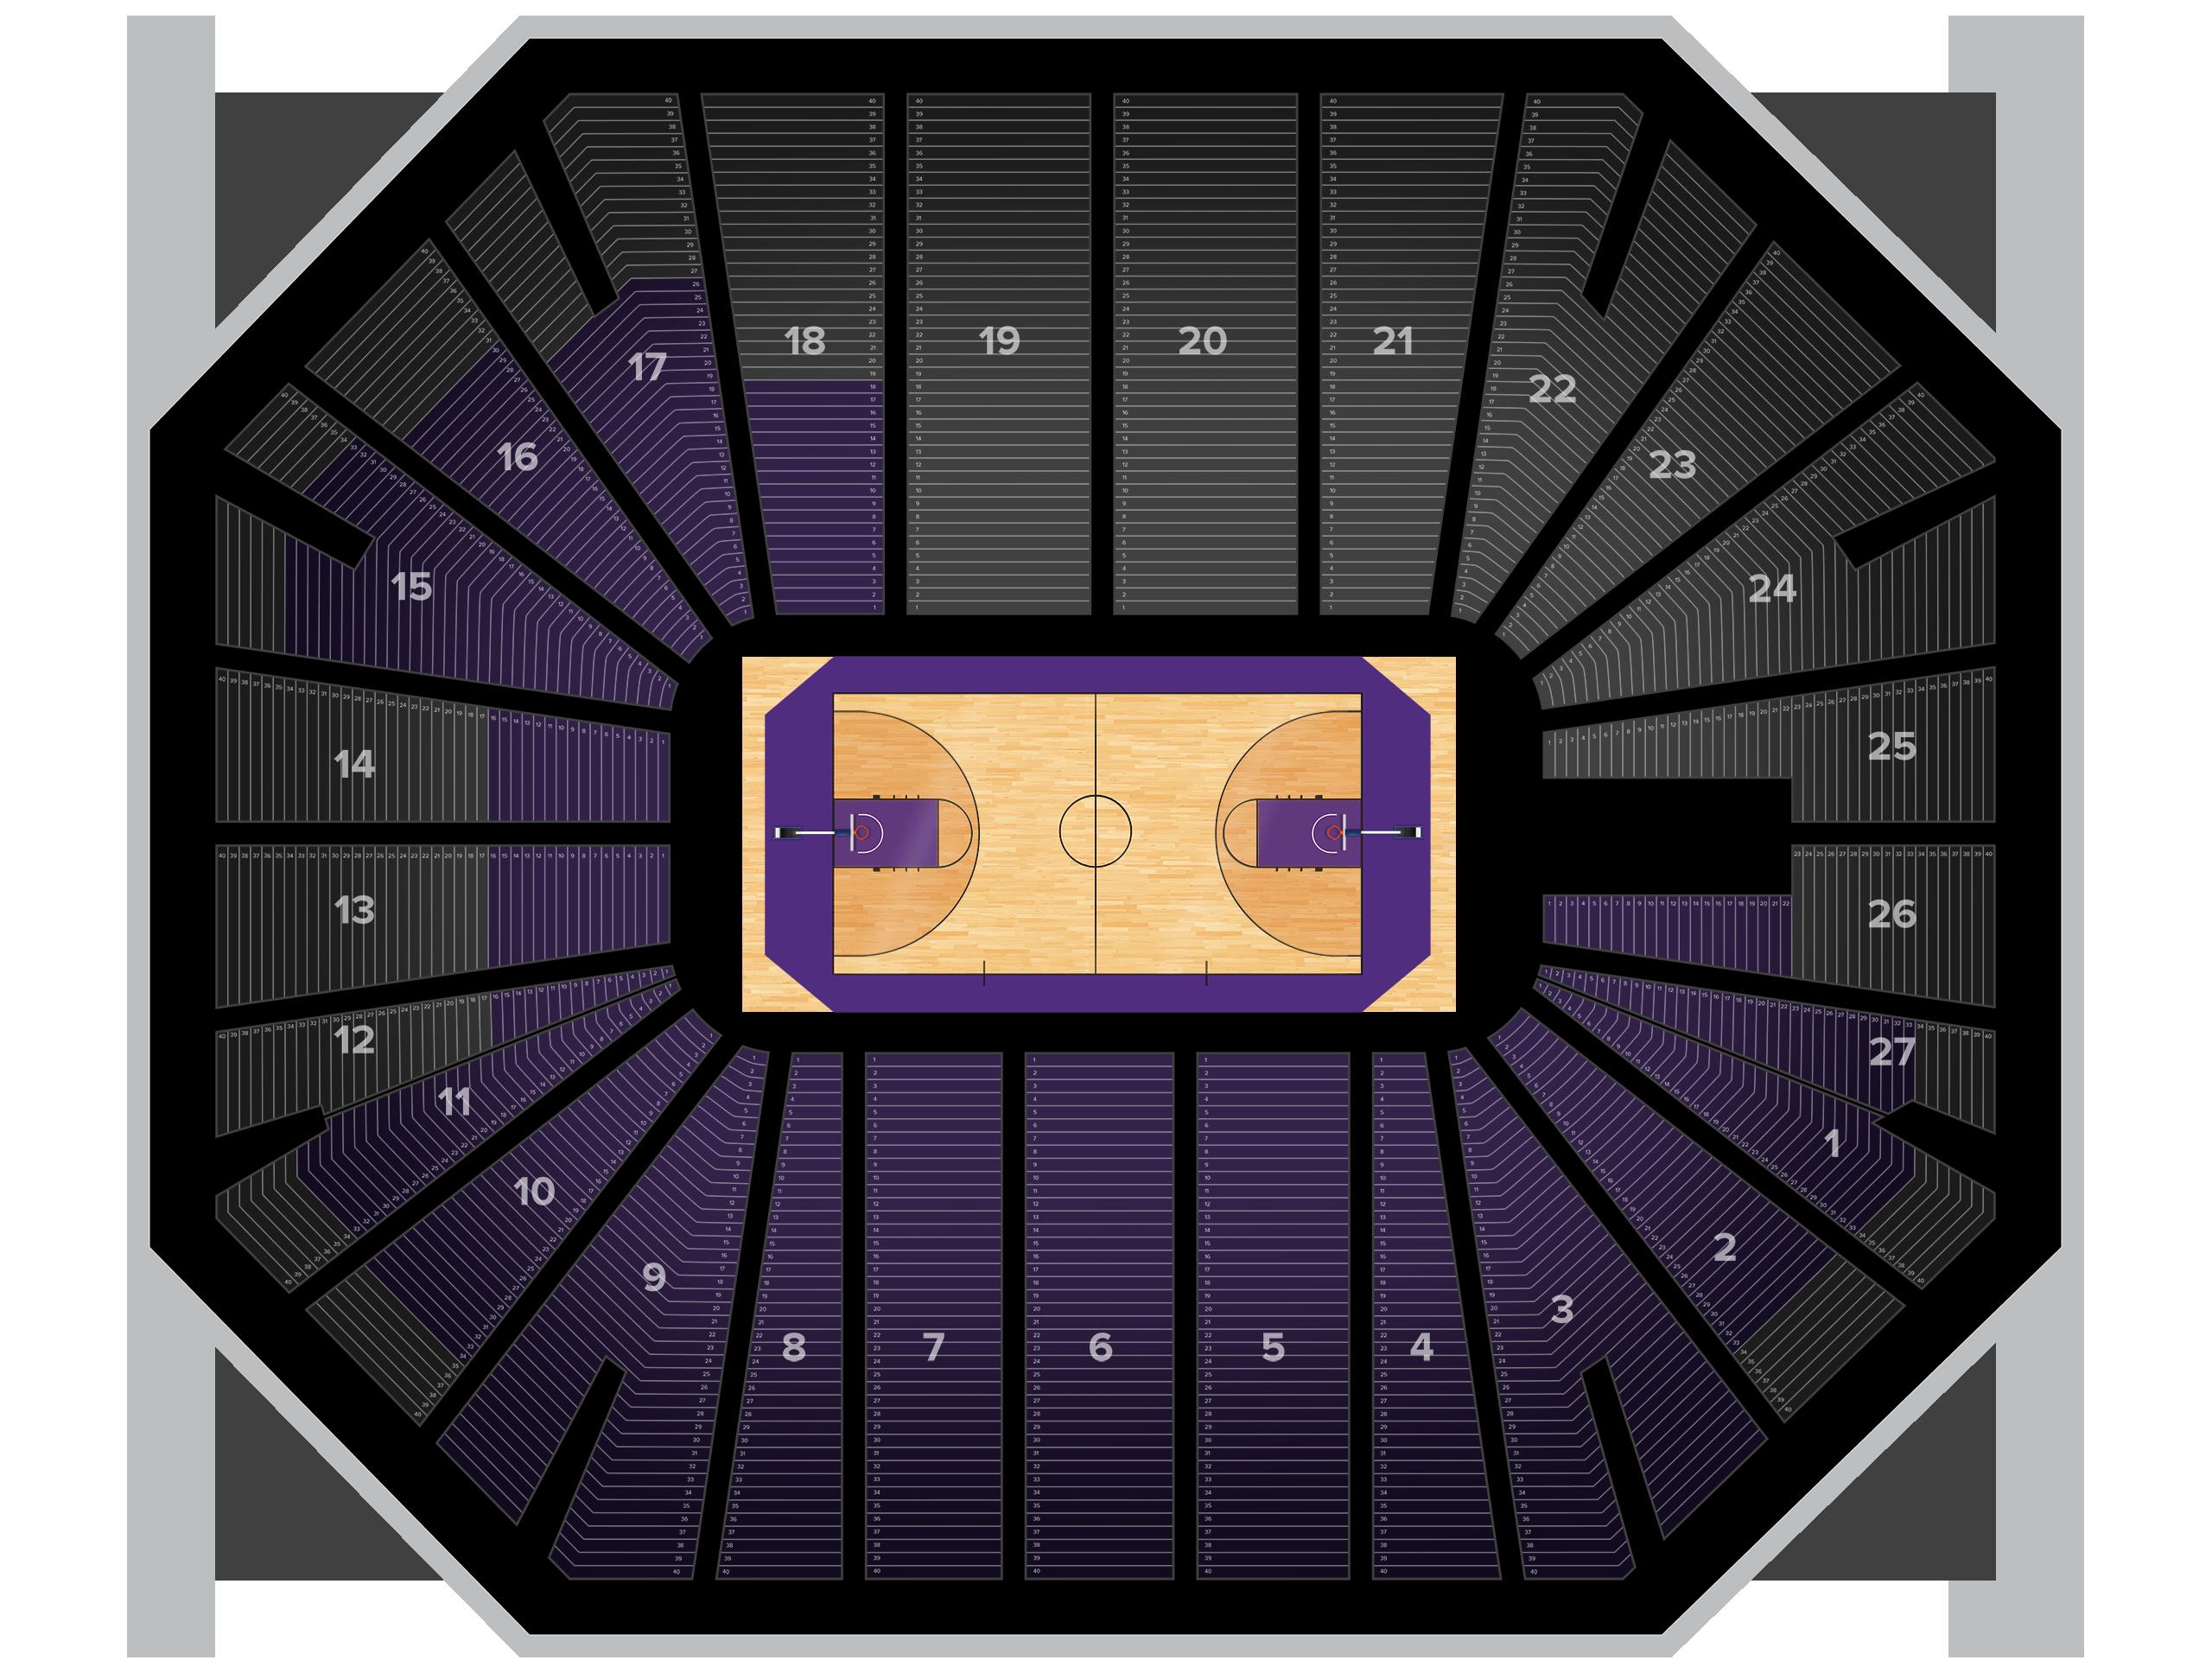 Bramlage Coliseum Tickets